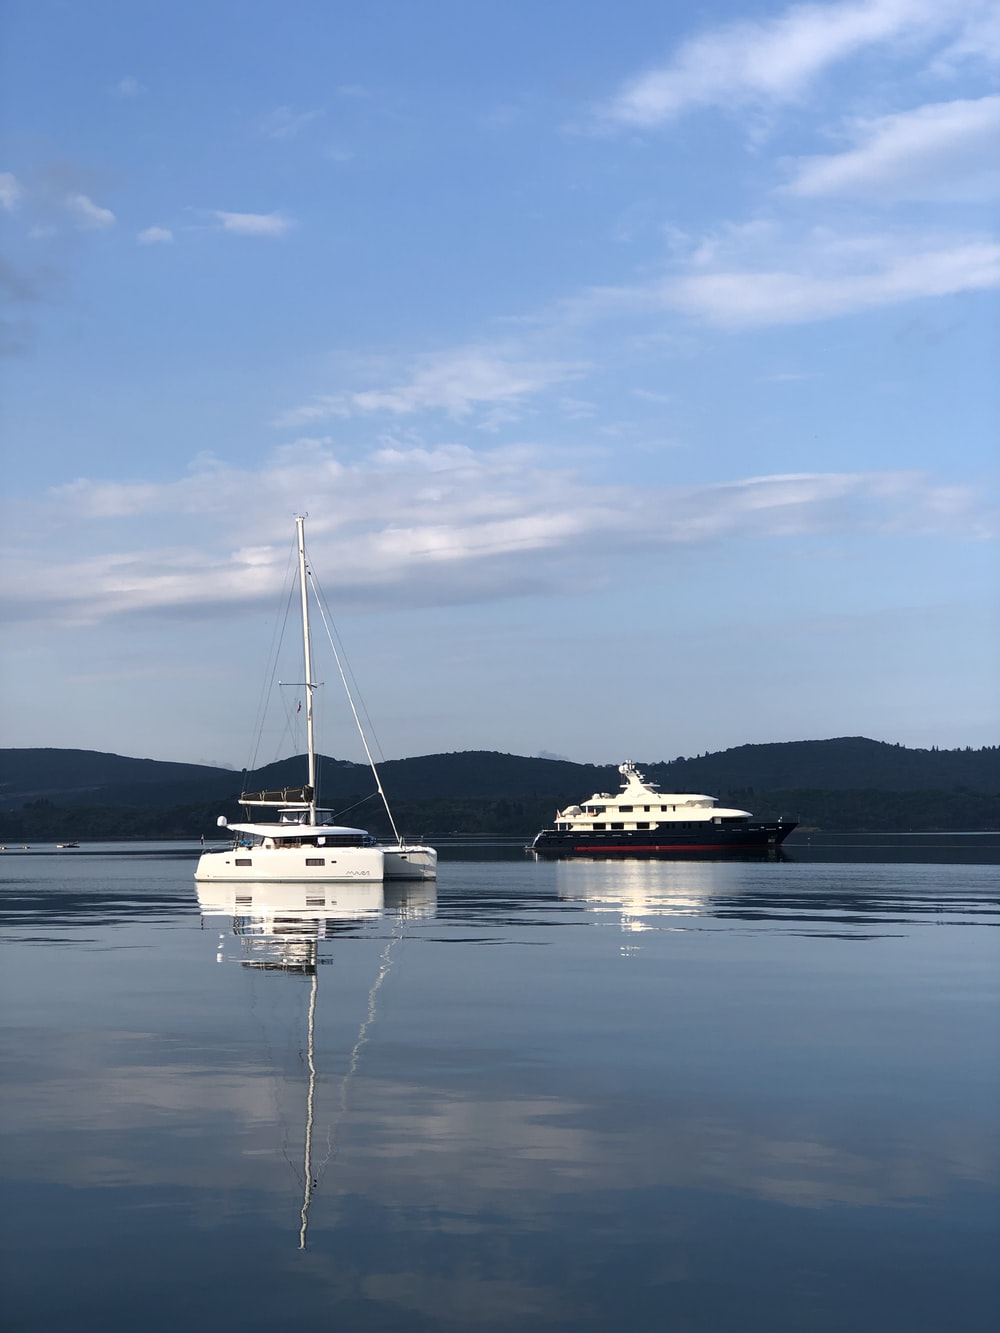 white boats in sea under blue sky